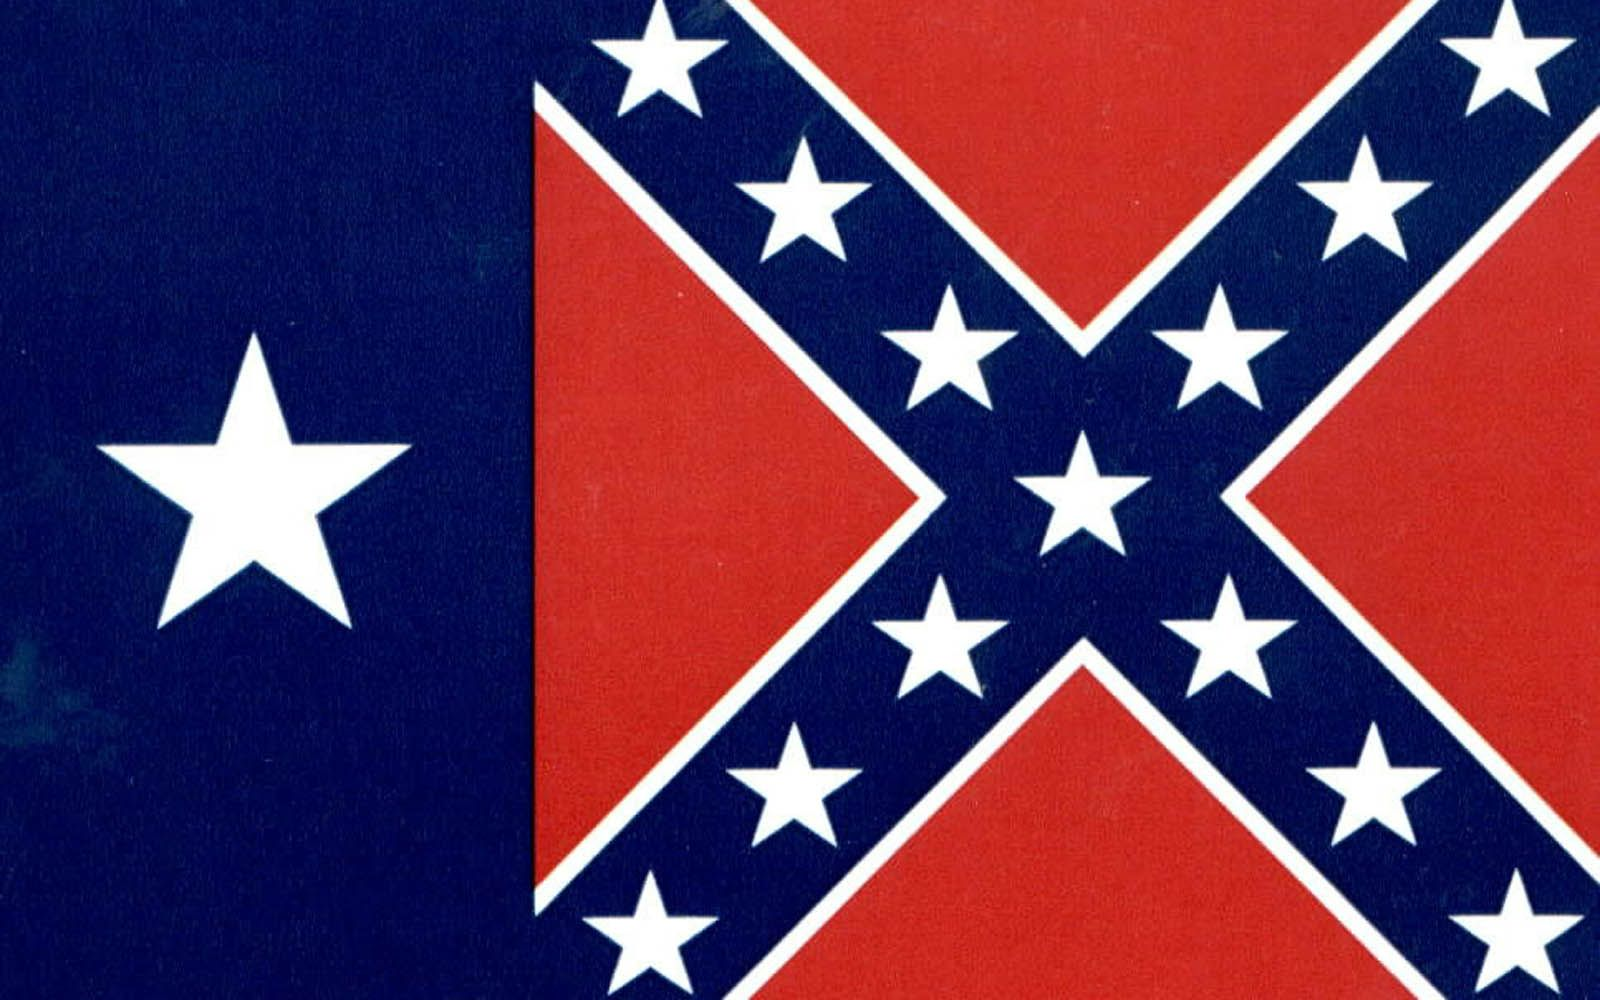 Texas Flag Wallpaper